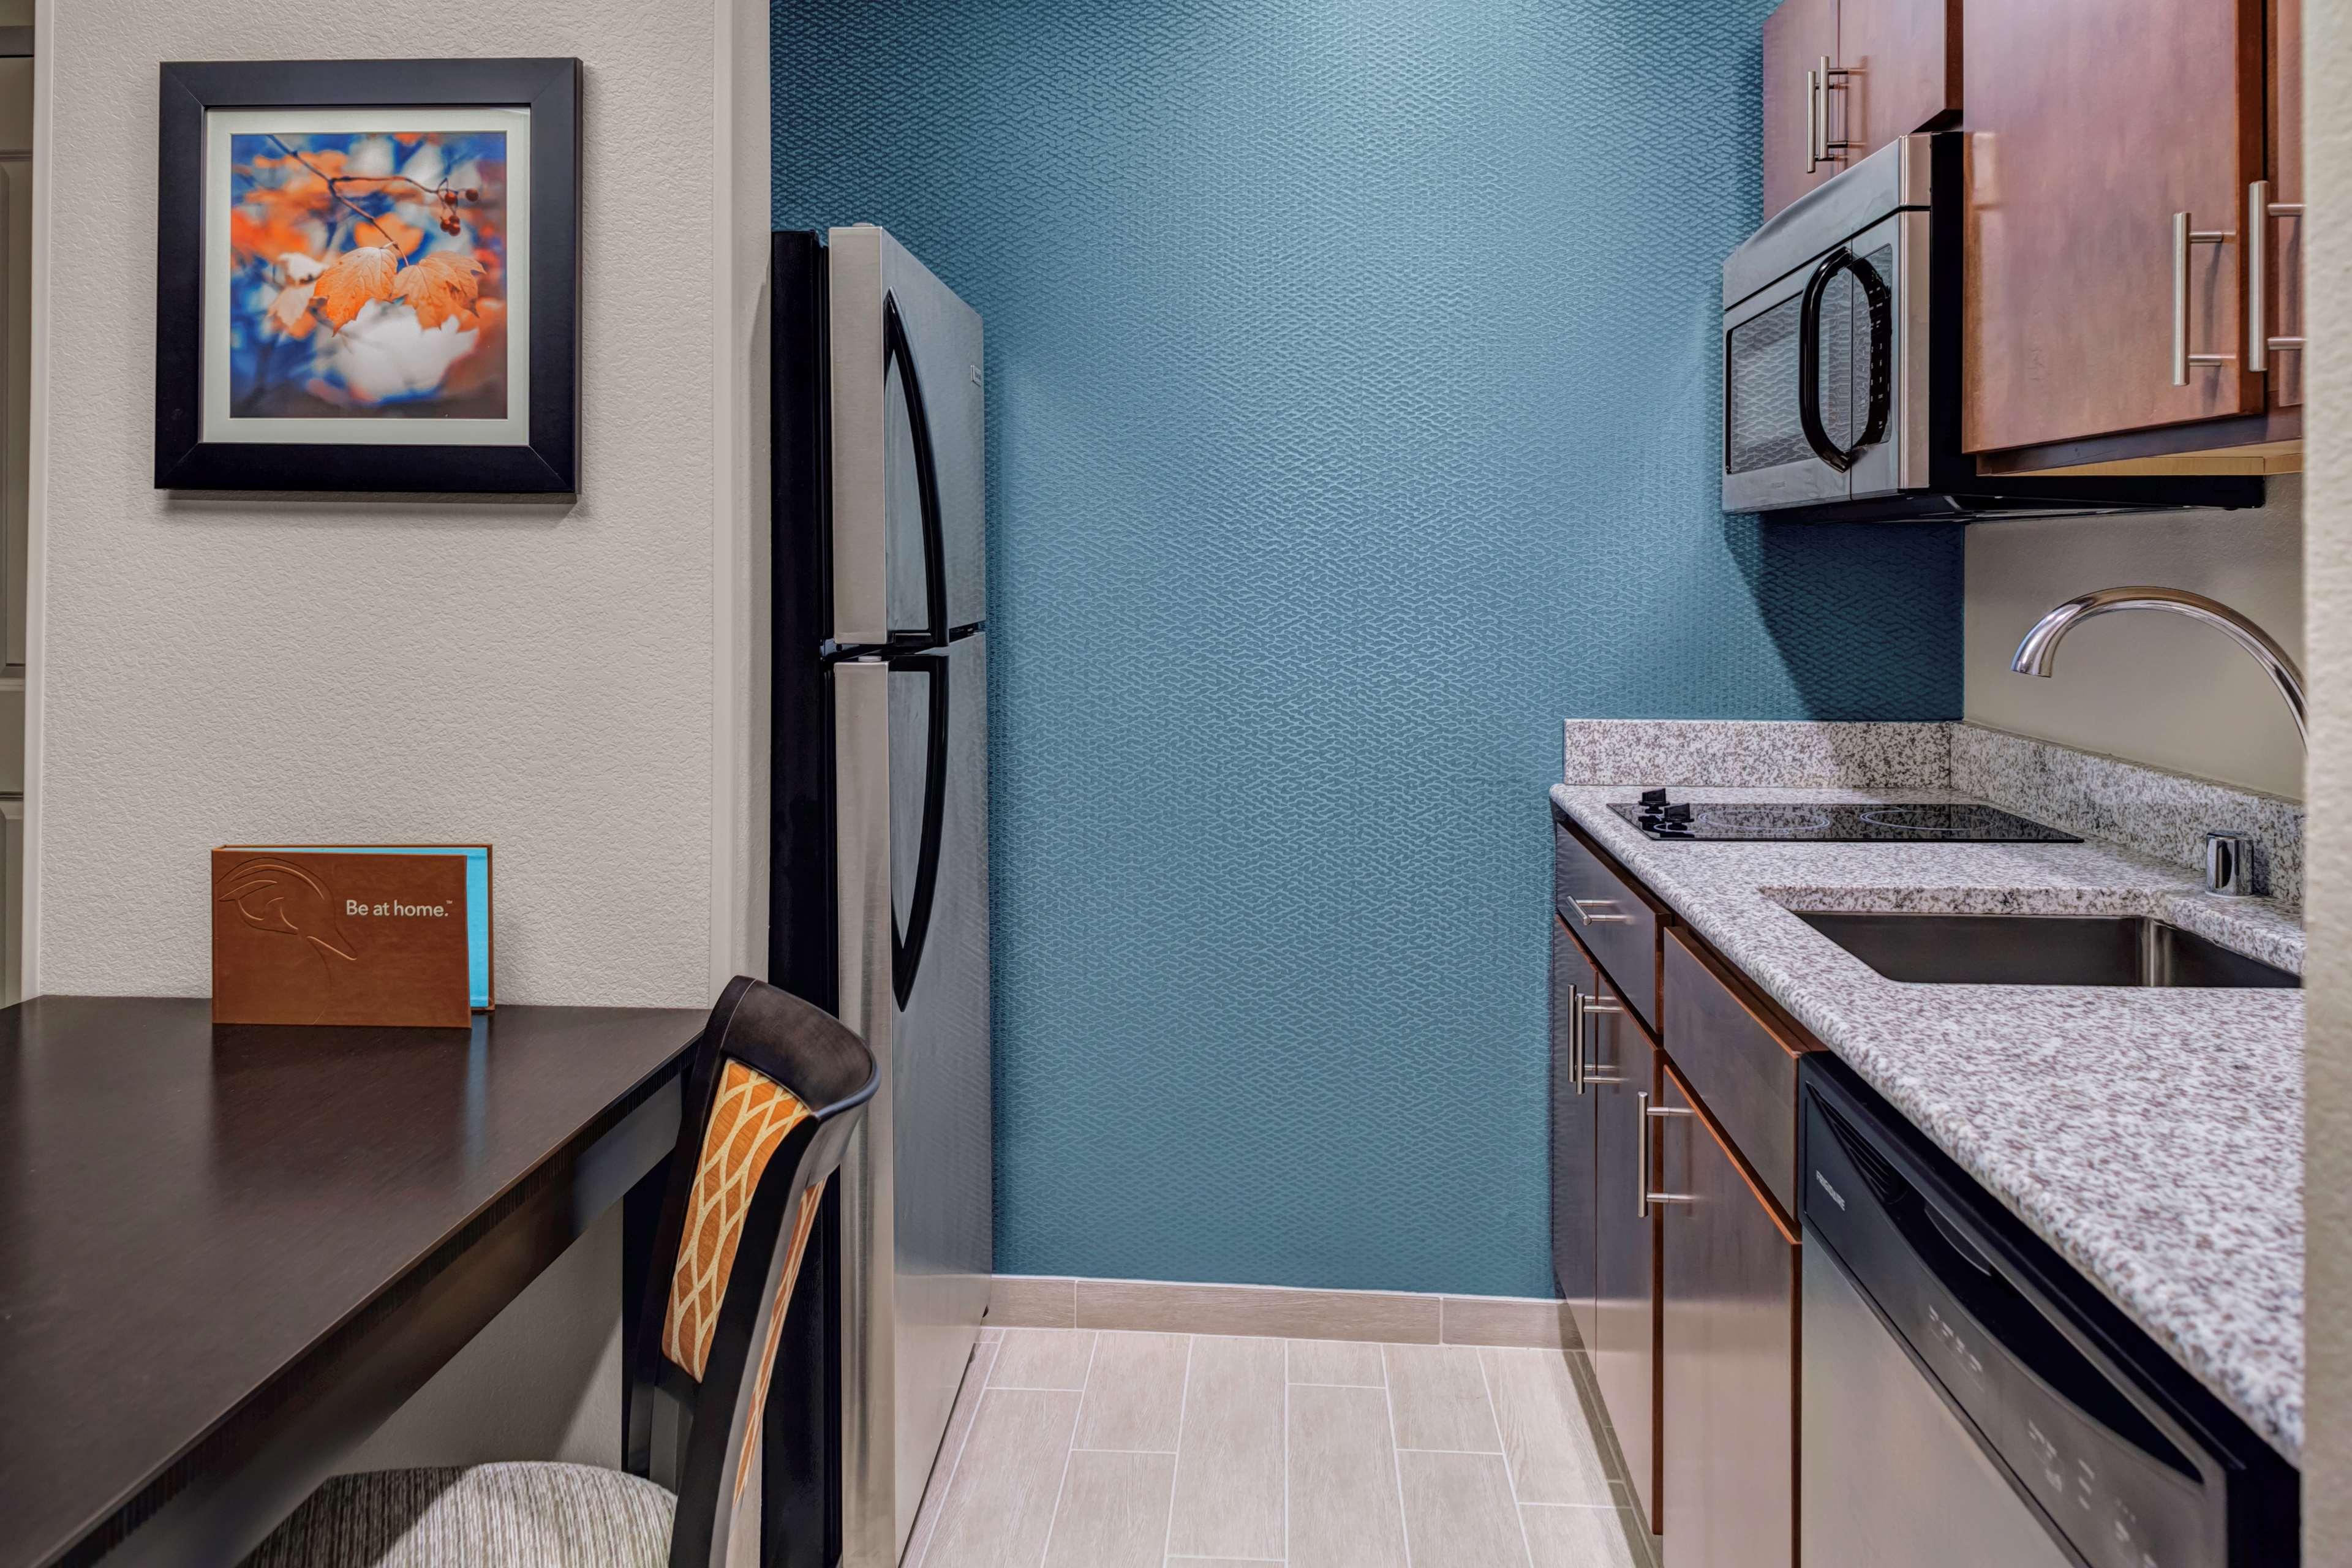 Homewood Suites by Hilton Wauwatosa Milwaukee image 16